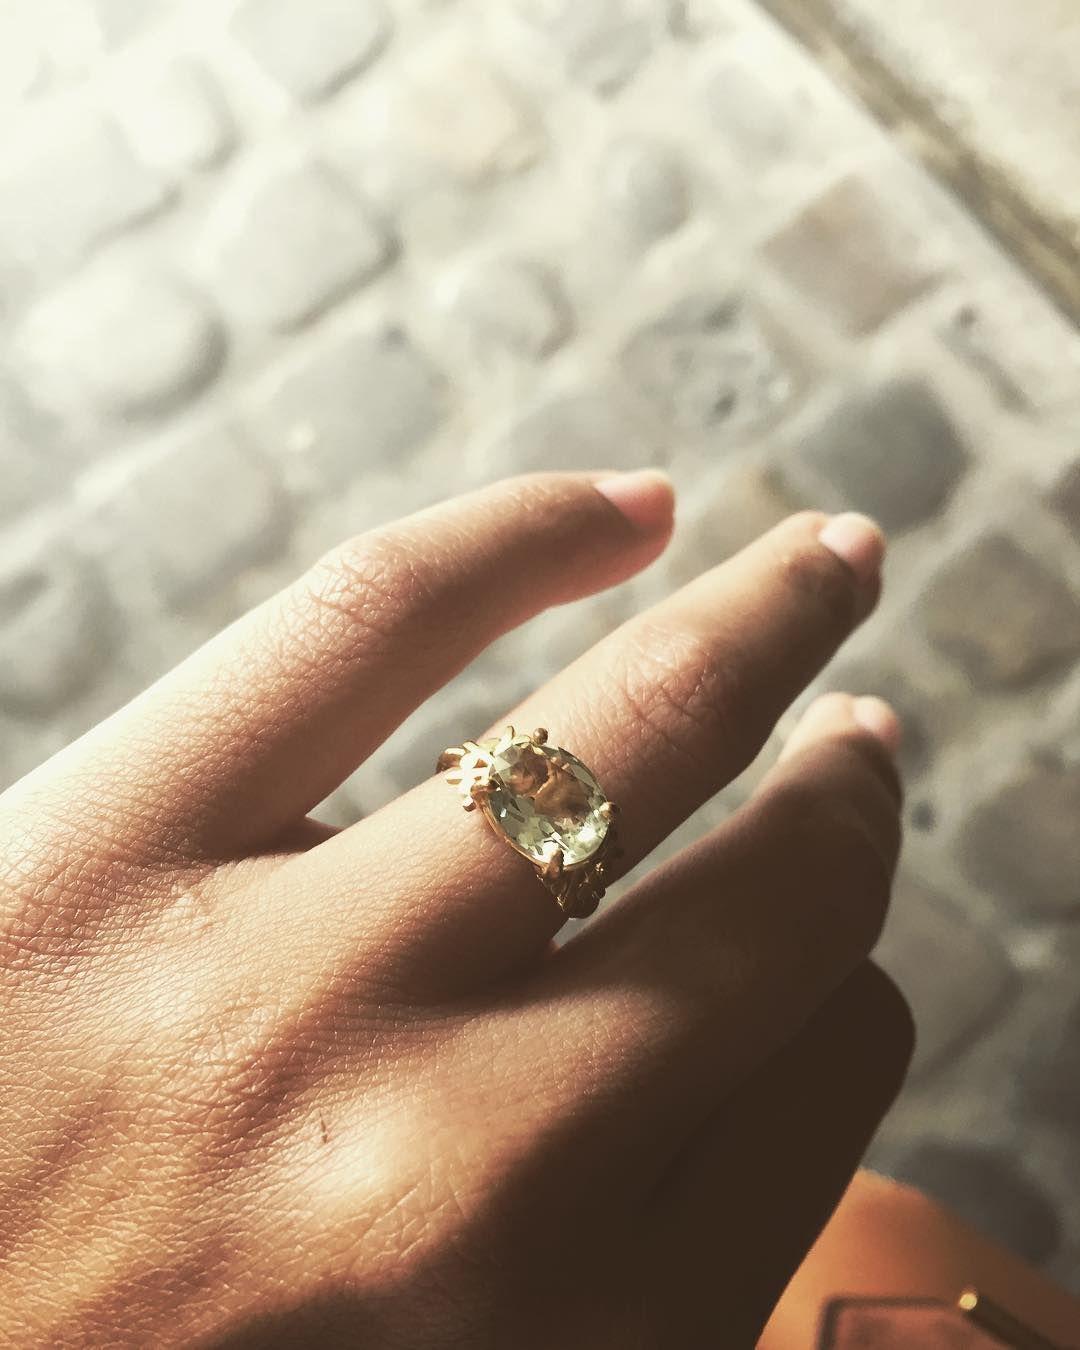 Bague Paros en Prasiolite récupérée chez le doreur. Plaquage 10 microns/24K. Le top ! #prasiolite #gemstone #naturalstone #watergreen #platedgold #ring #leaves #sunrise #small #pattern #summer #handmade #jewelry